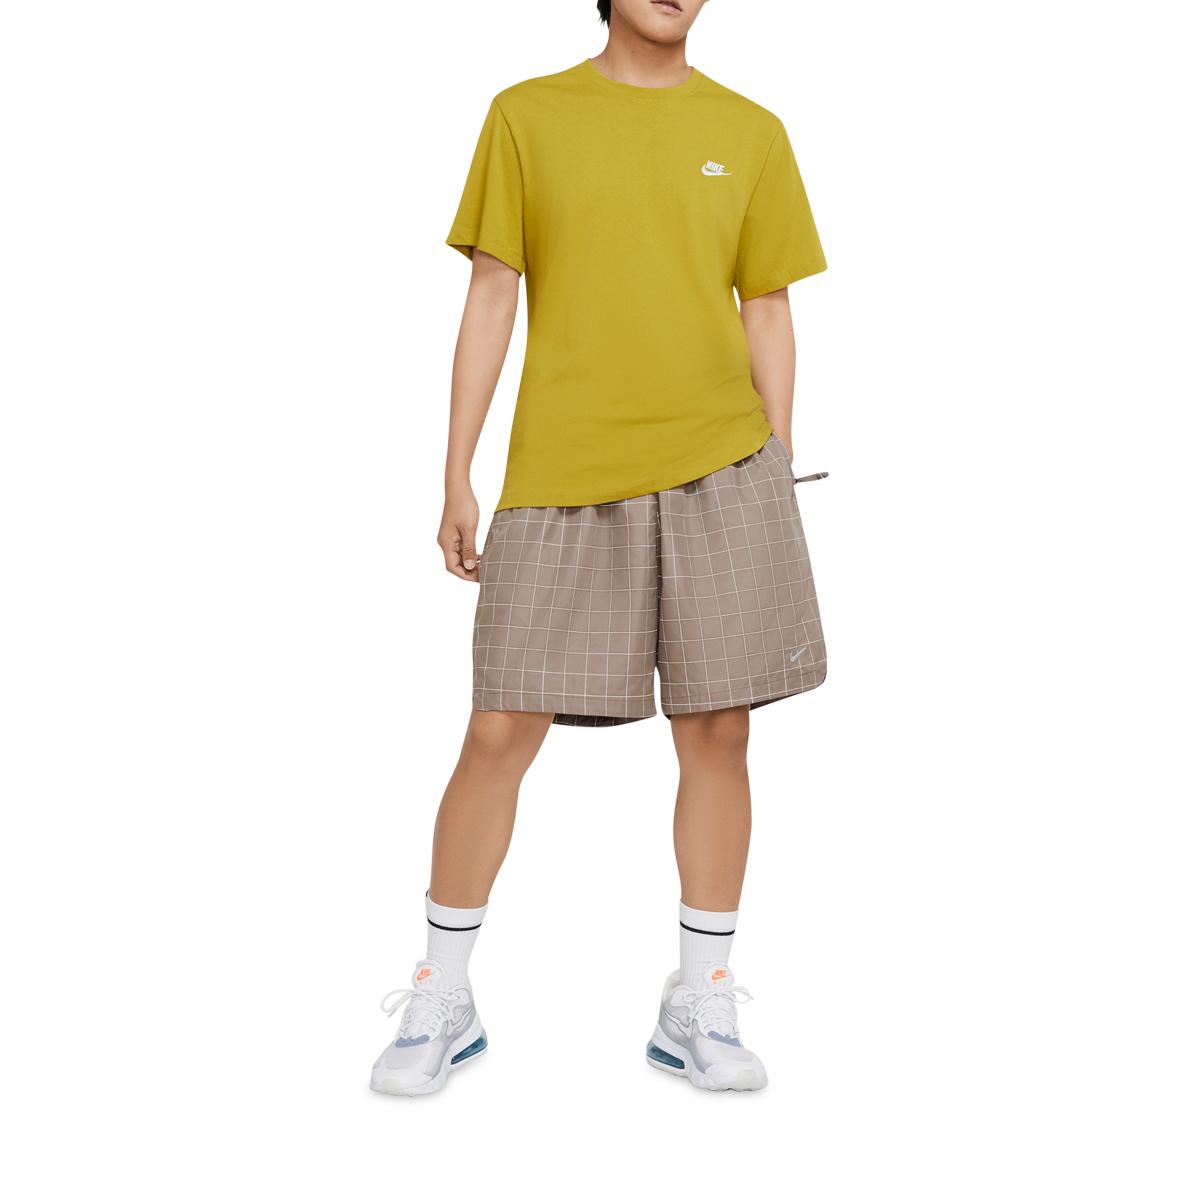 Nike Reflective Short